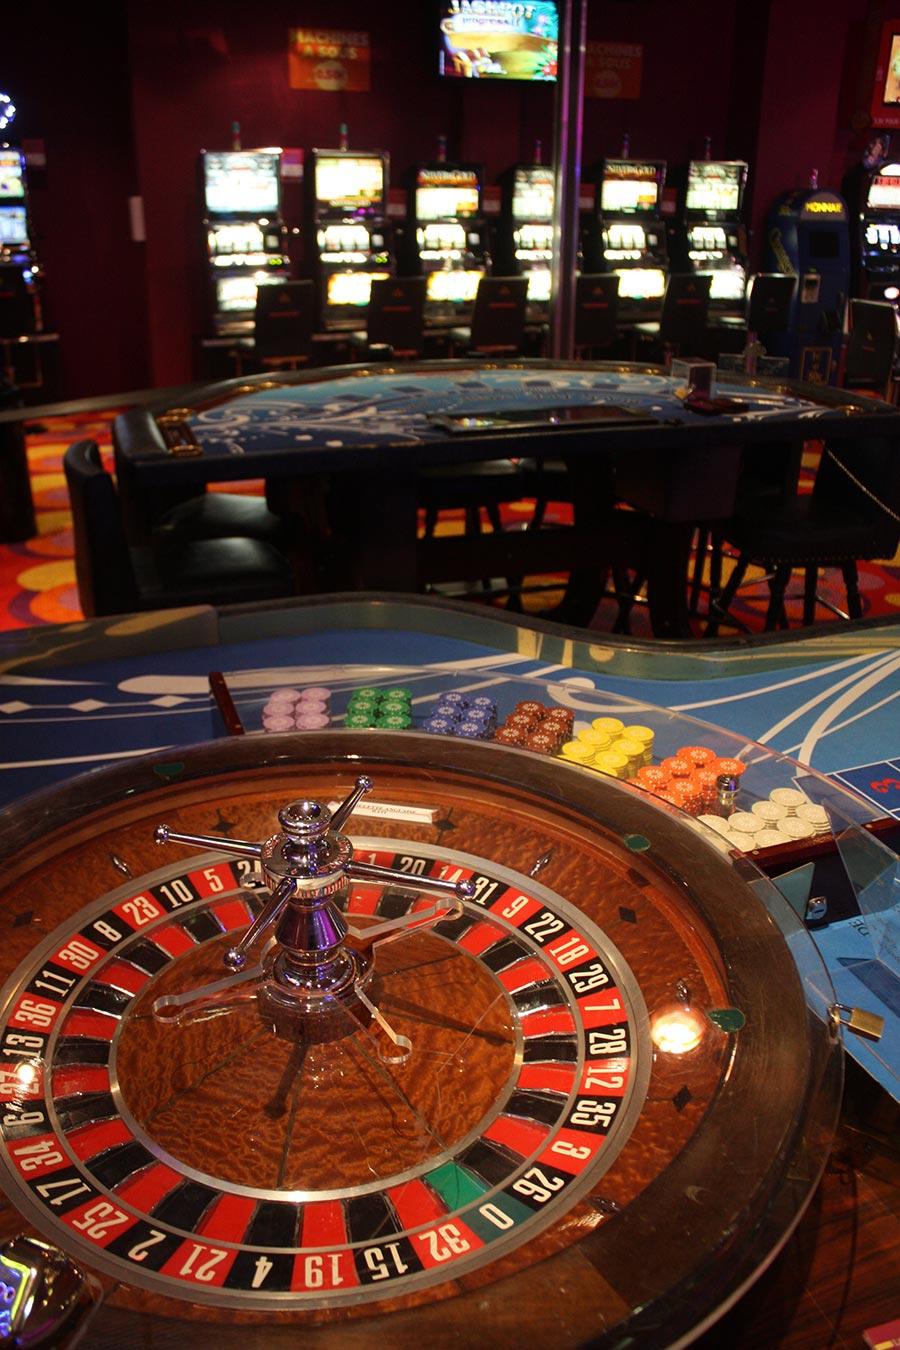 Casino ouvert le 11 novembre 2018